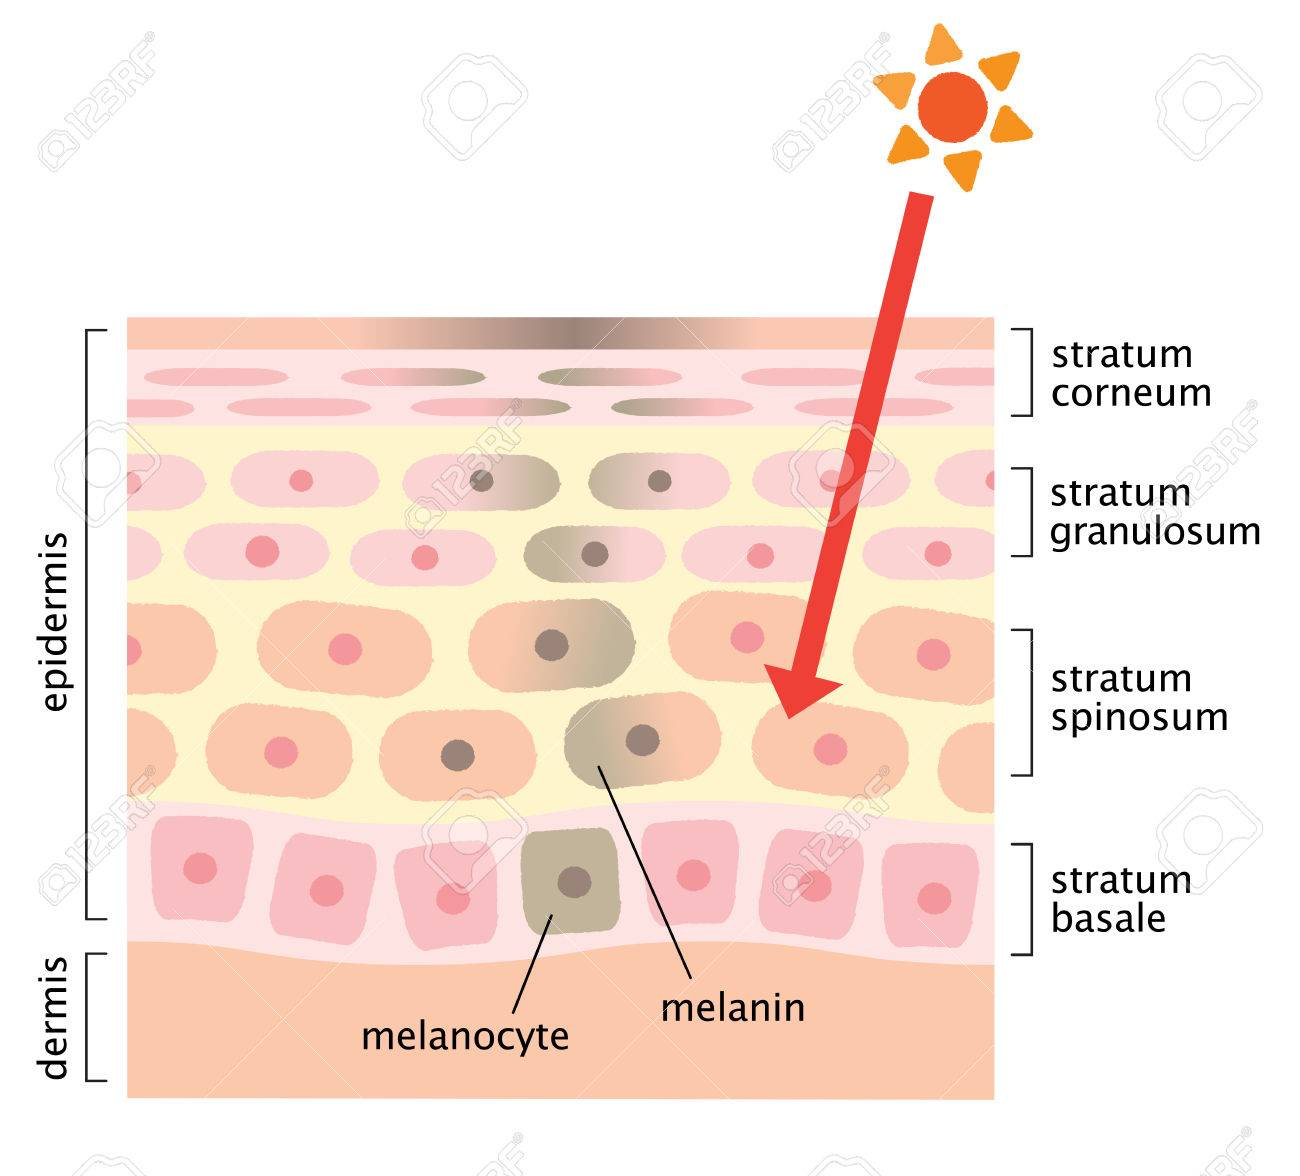 skin mechanism of facial blotches - 58439505